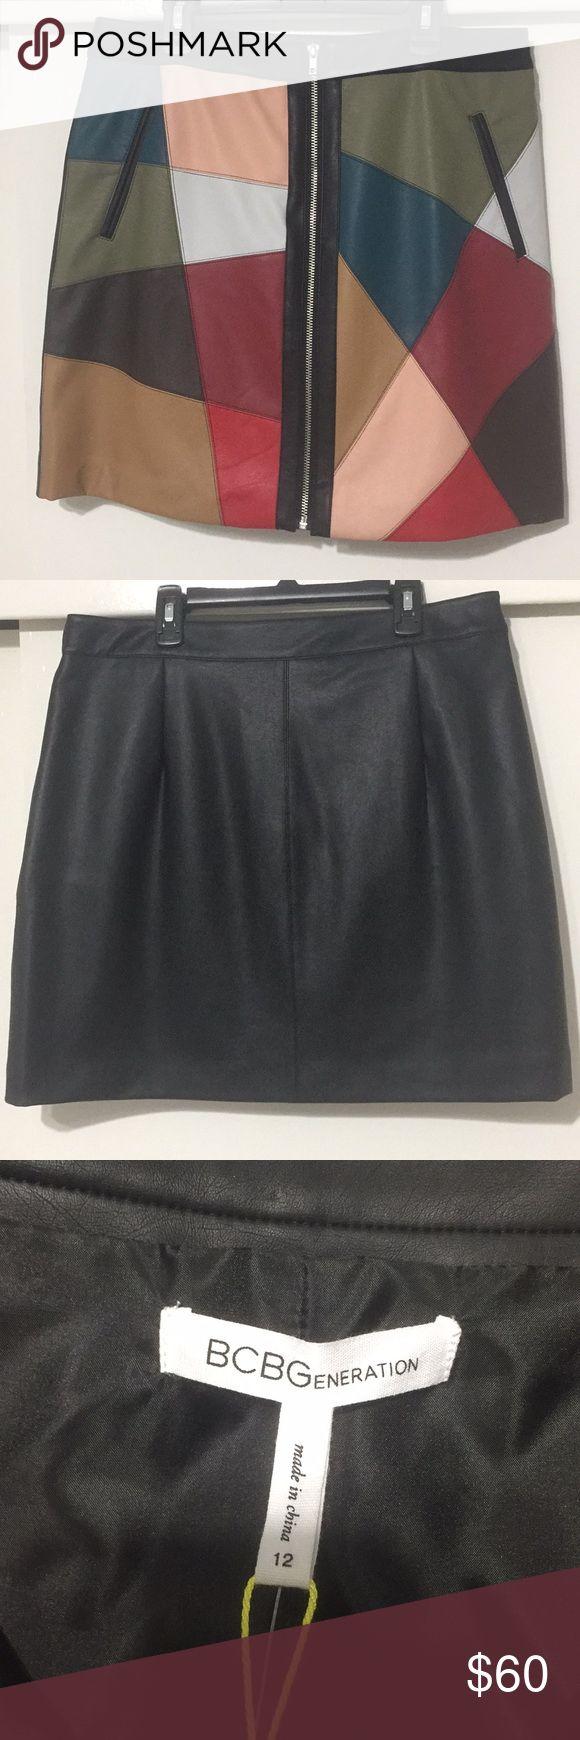 BCBG Colorful Leather Skirt BCBG Generation Multicolor Leather skirt BCBGeneration Skirts Midi